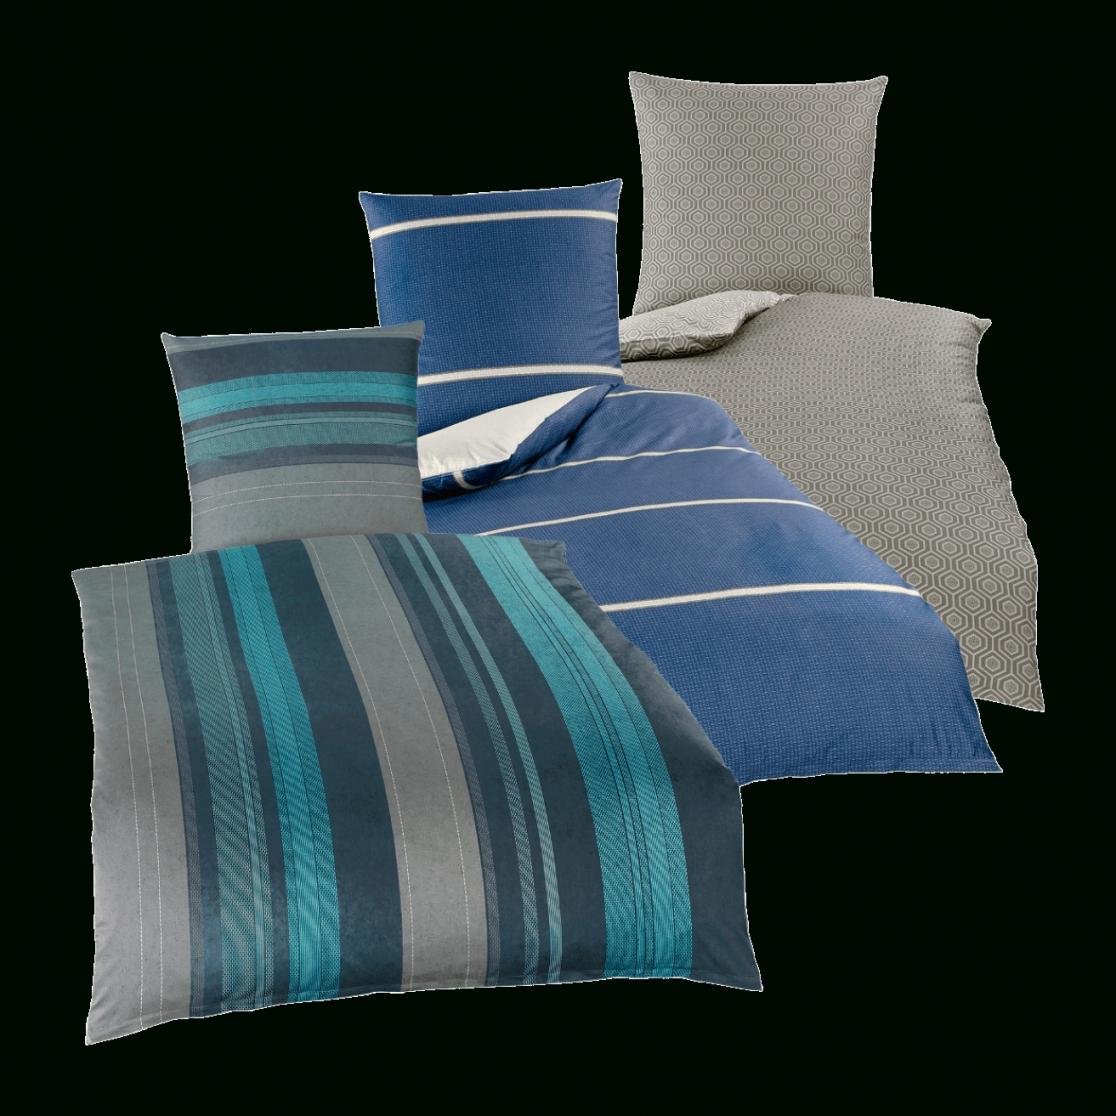 mako satin bettw sche aldi haus design ideen. Black Bedroom Furniture Sets. Home Design Ideas